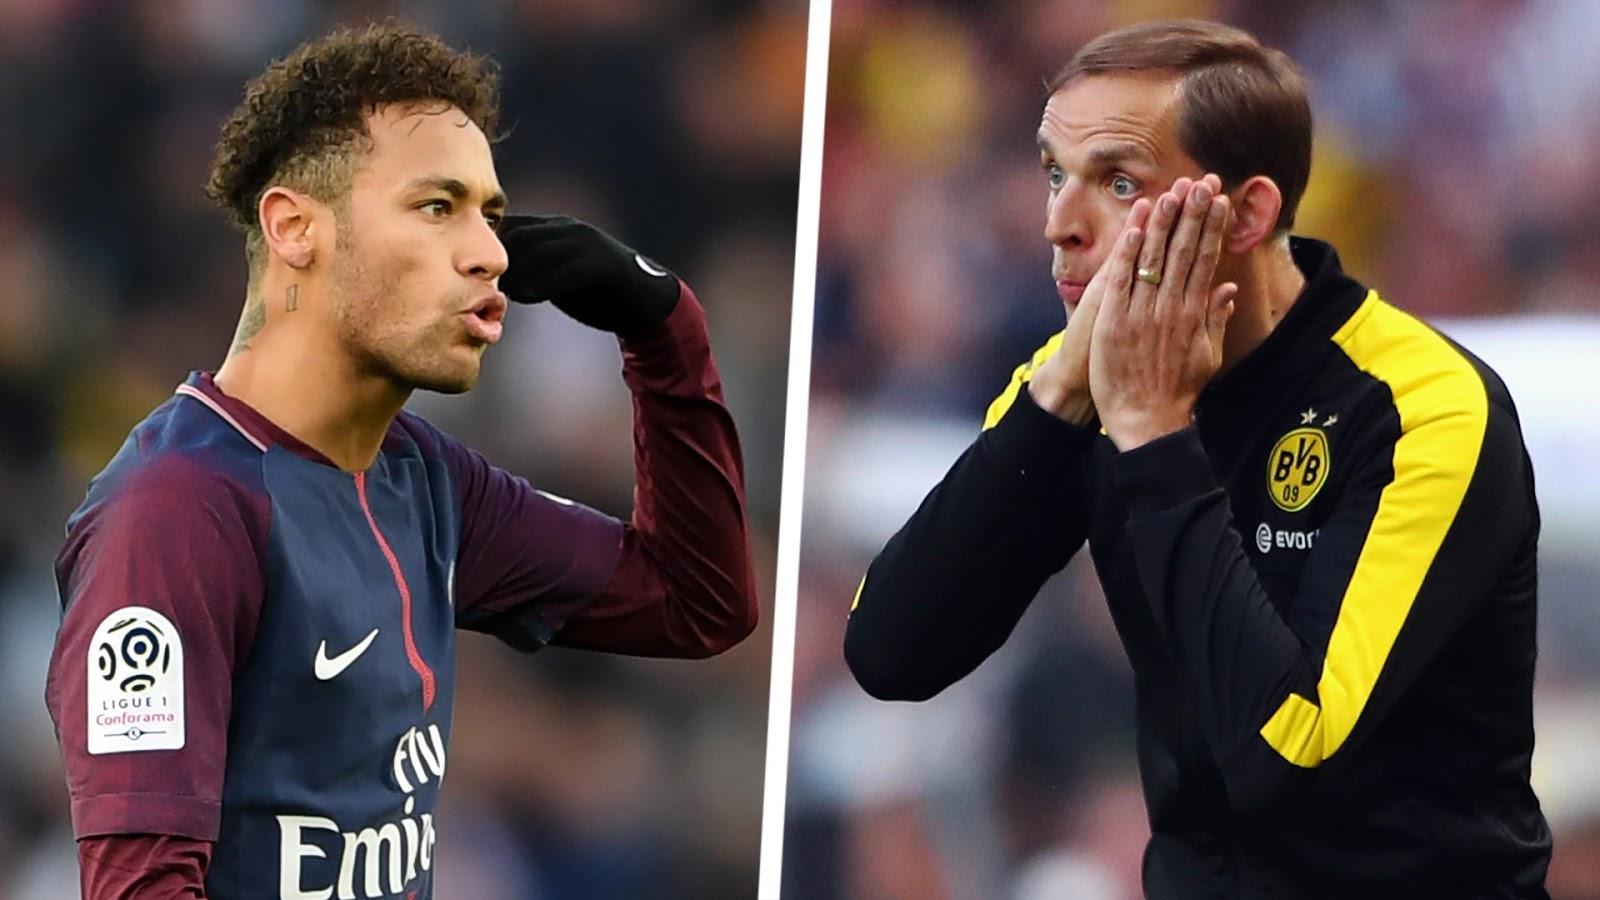 tai-sao-con-ac-mong-nhat-cua-Neymar-co-the-den-Paris